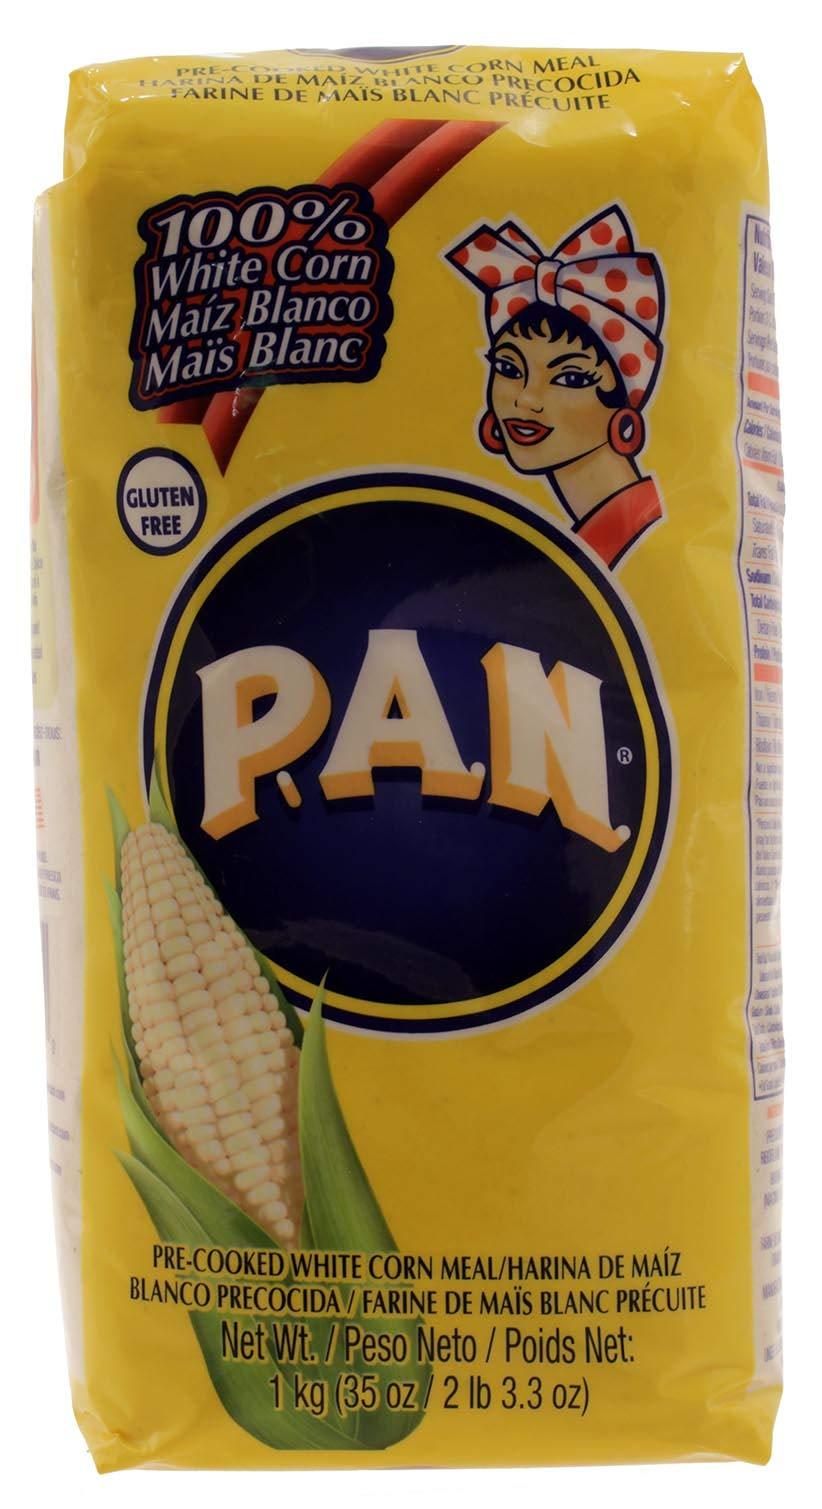 Harina P.a.n. White Corn Meal 1 kg(35 oz/2 lb 3.3 oz)